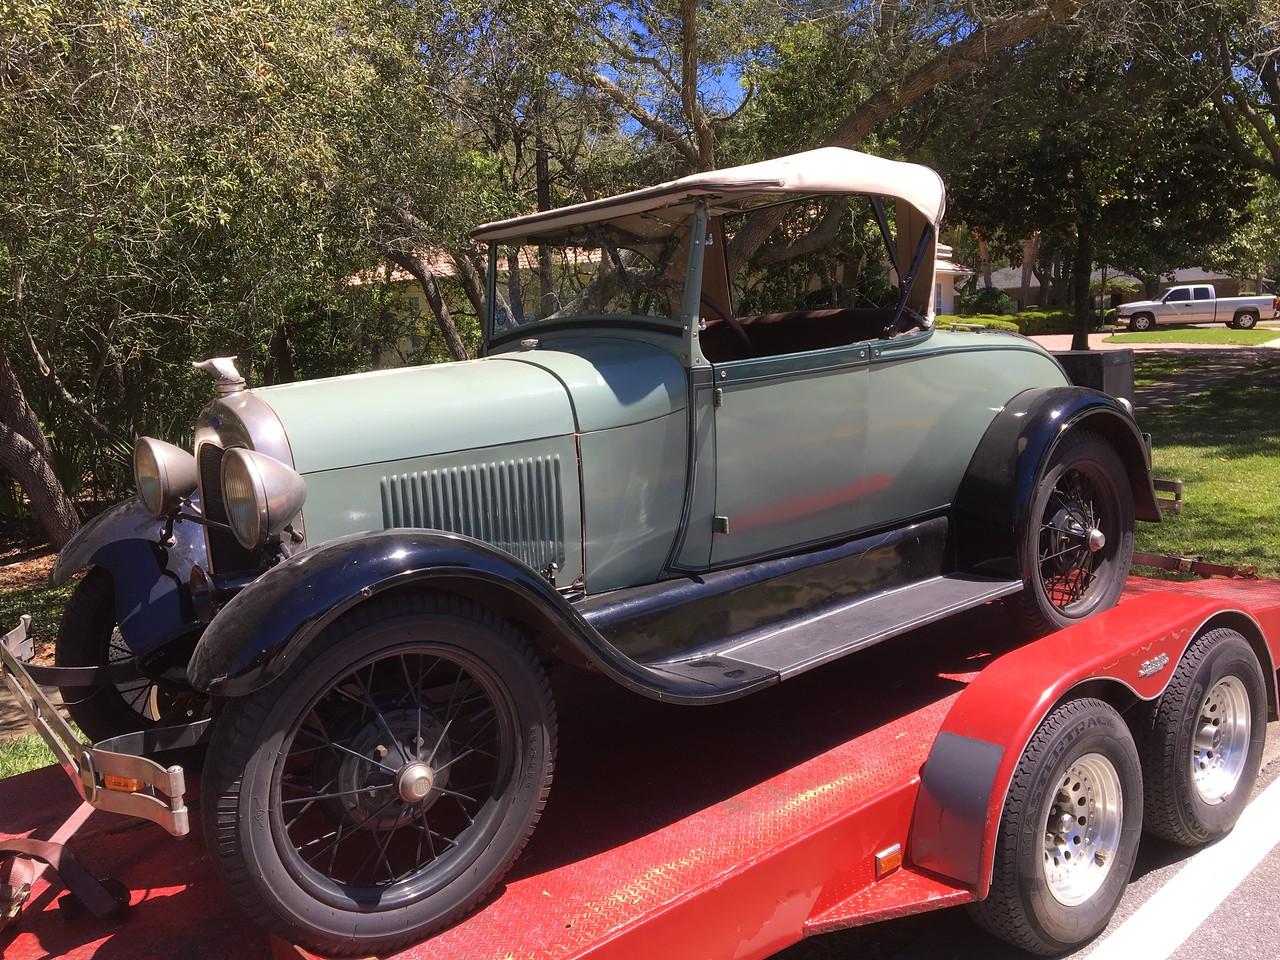 1928 Ford Midel A AR (Destin, Florida to Bradenton, Florida)